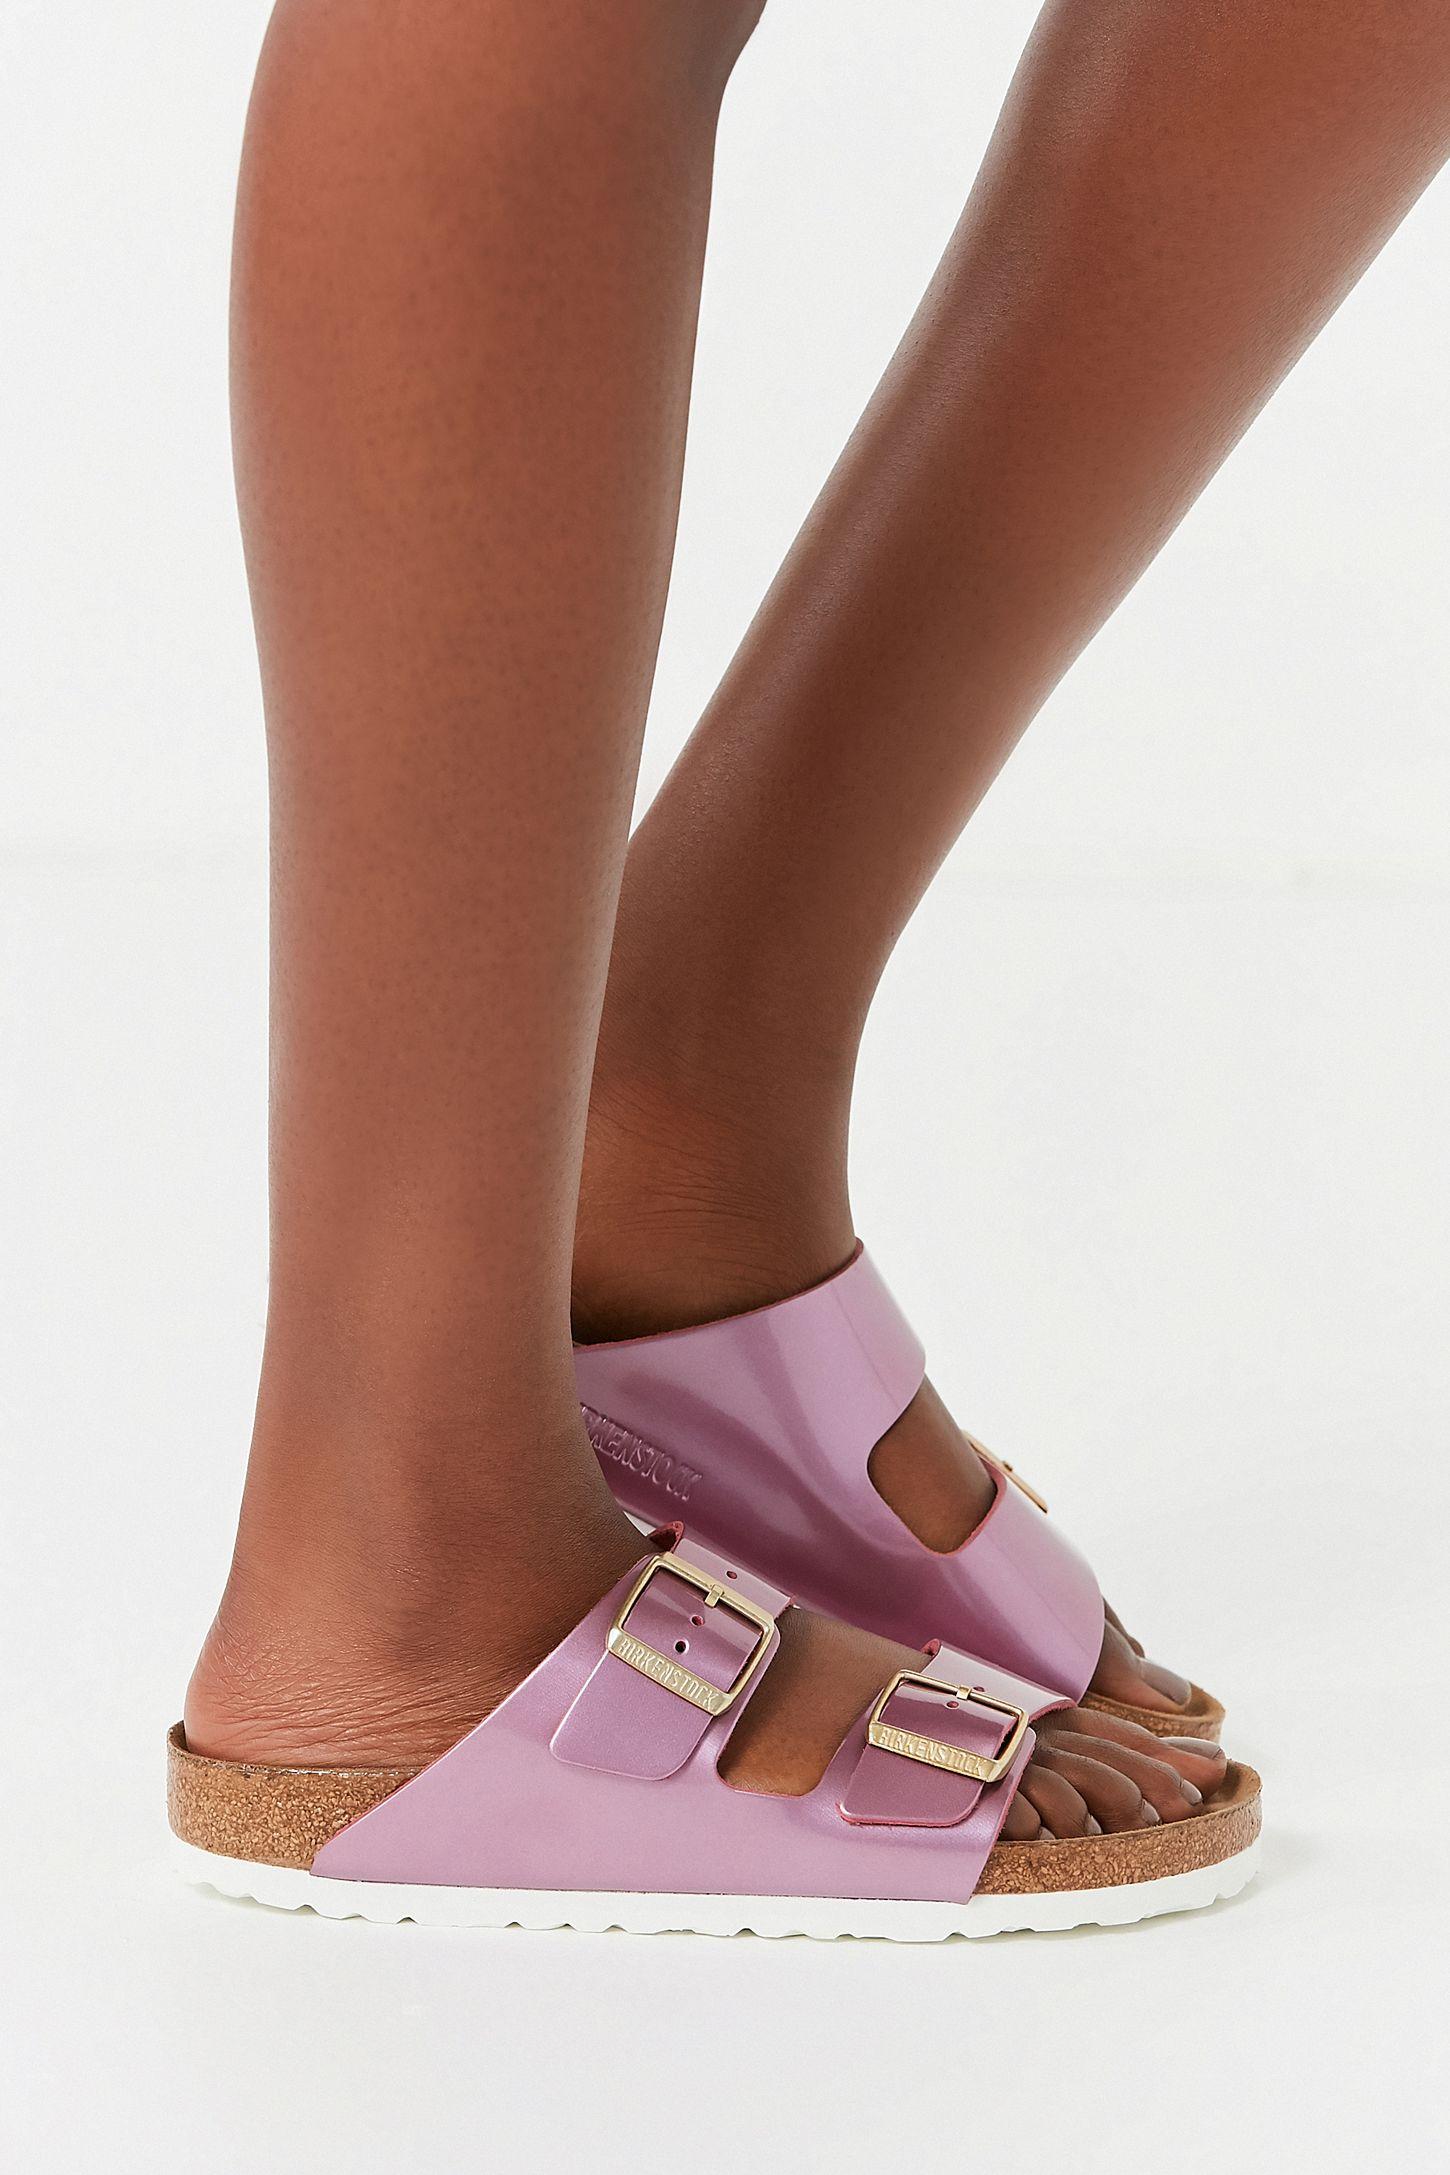 44c6cdfda088 Slide View  4  Birkenstock Arizona Soft Footbed Metallic Sandal